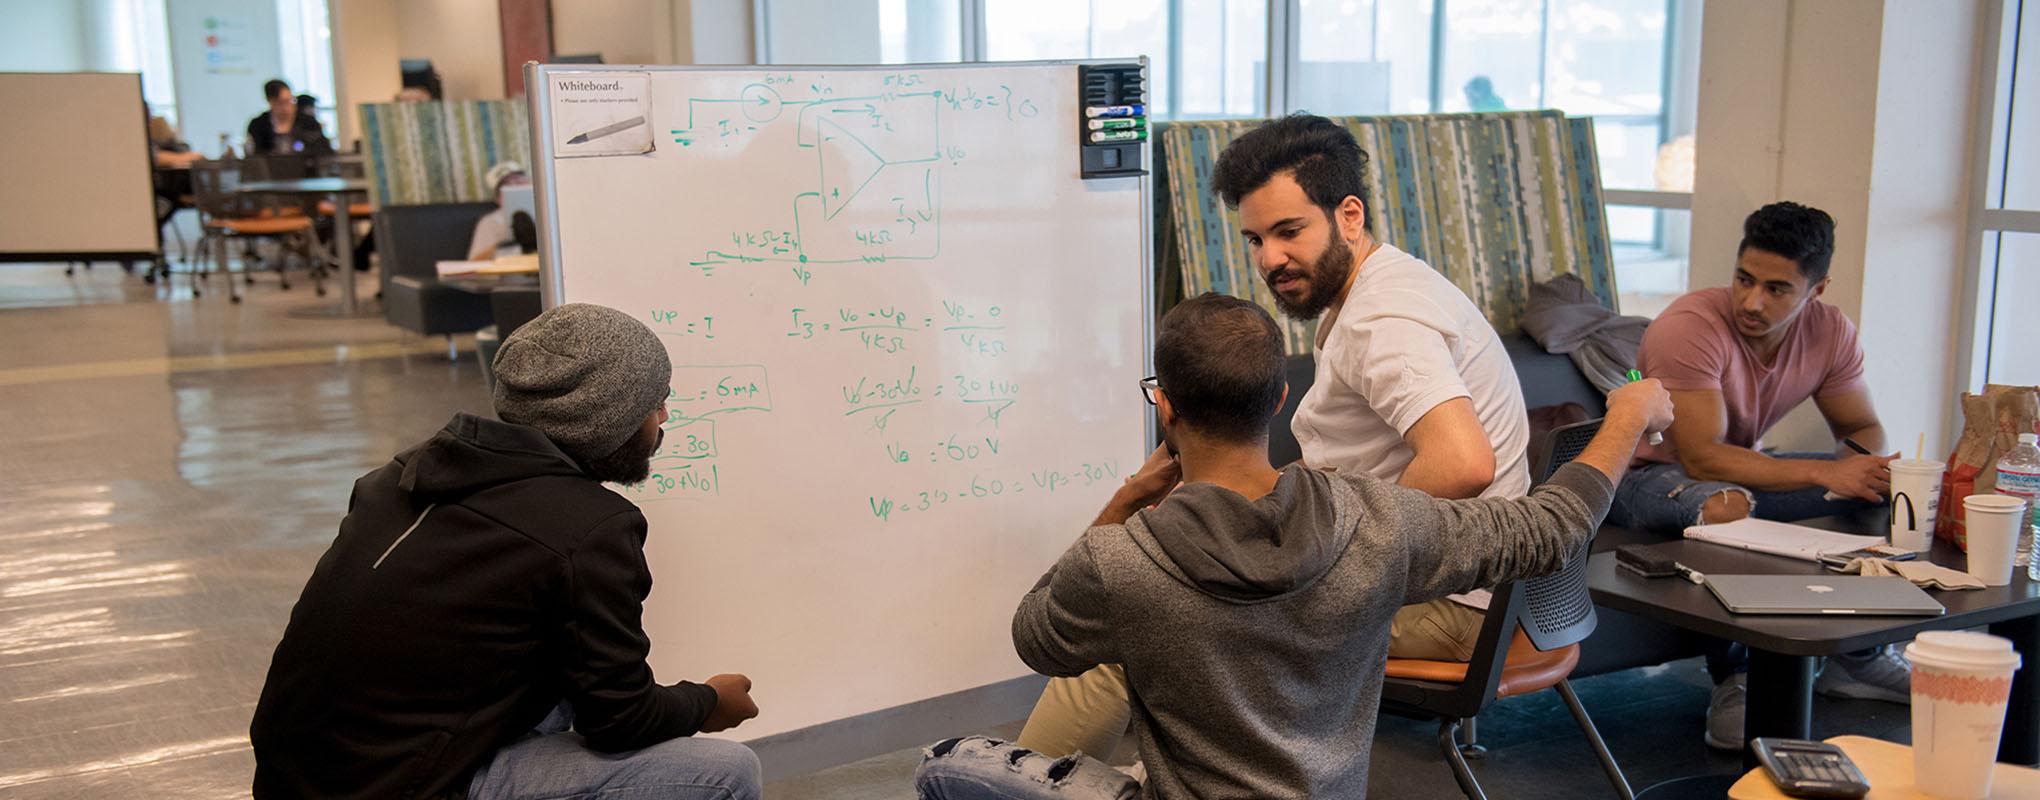 Students sitting around studying